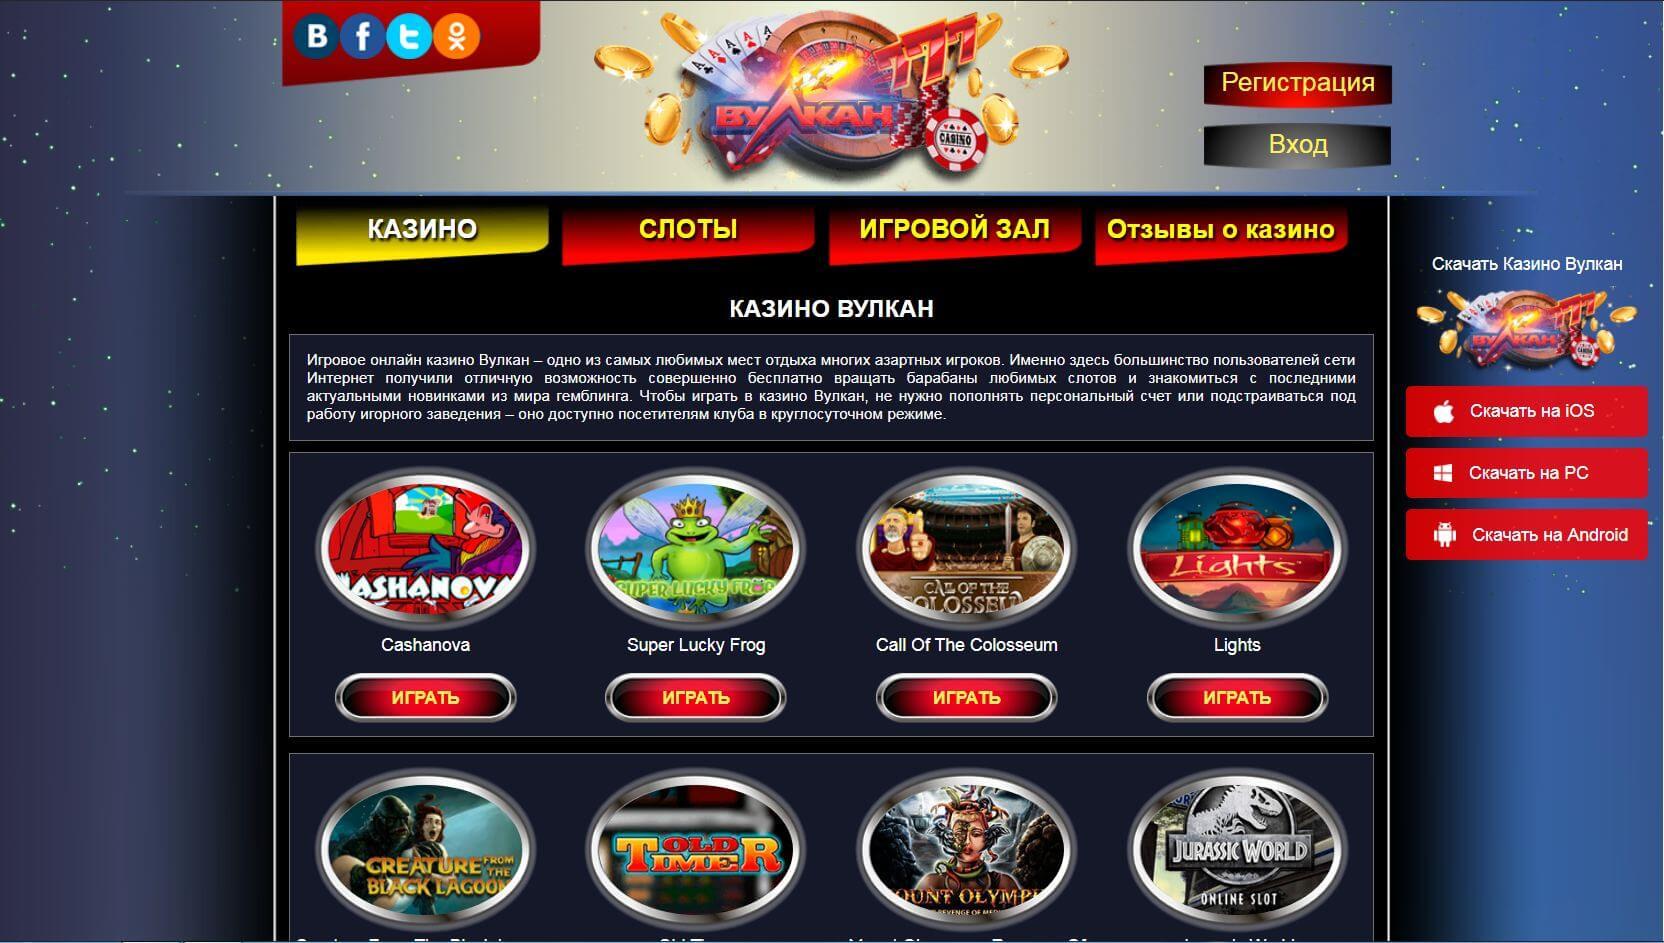 Прога для взлома интернет казино